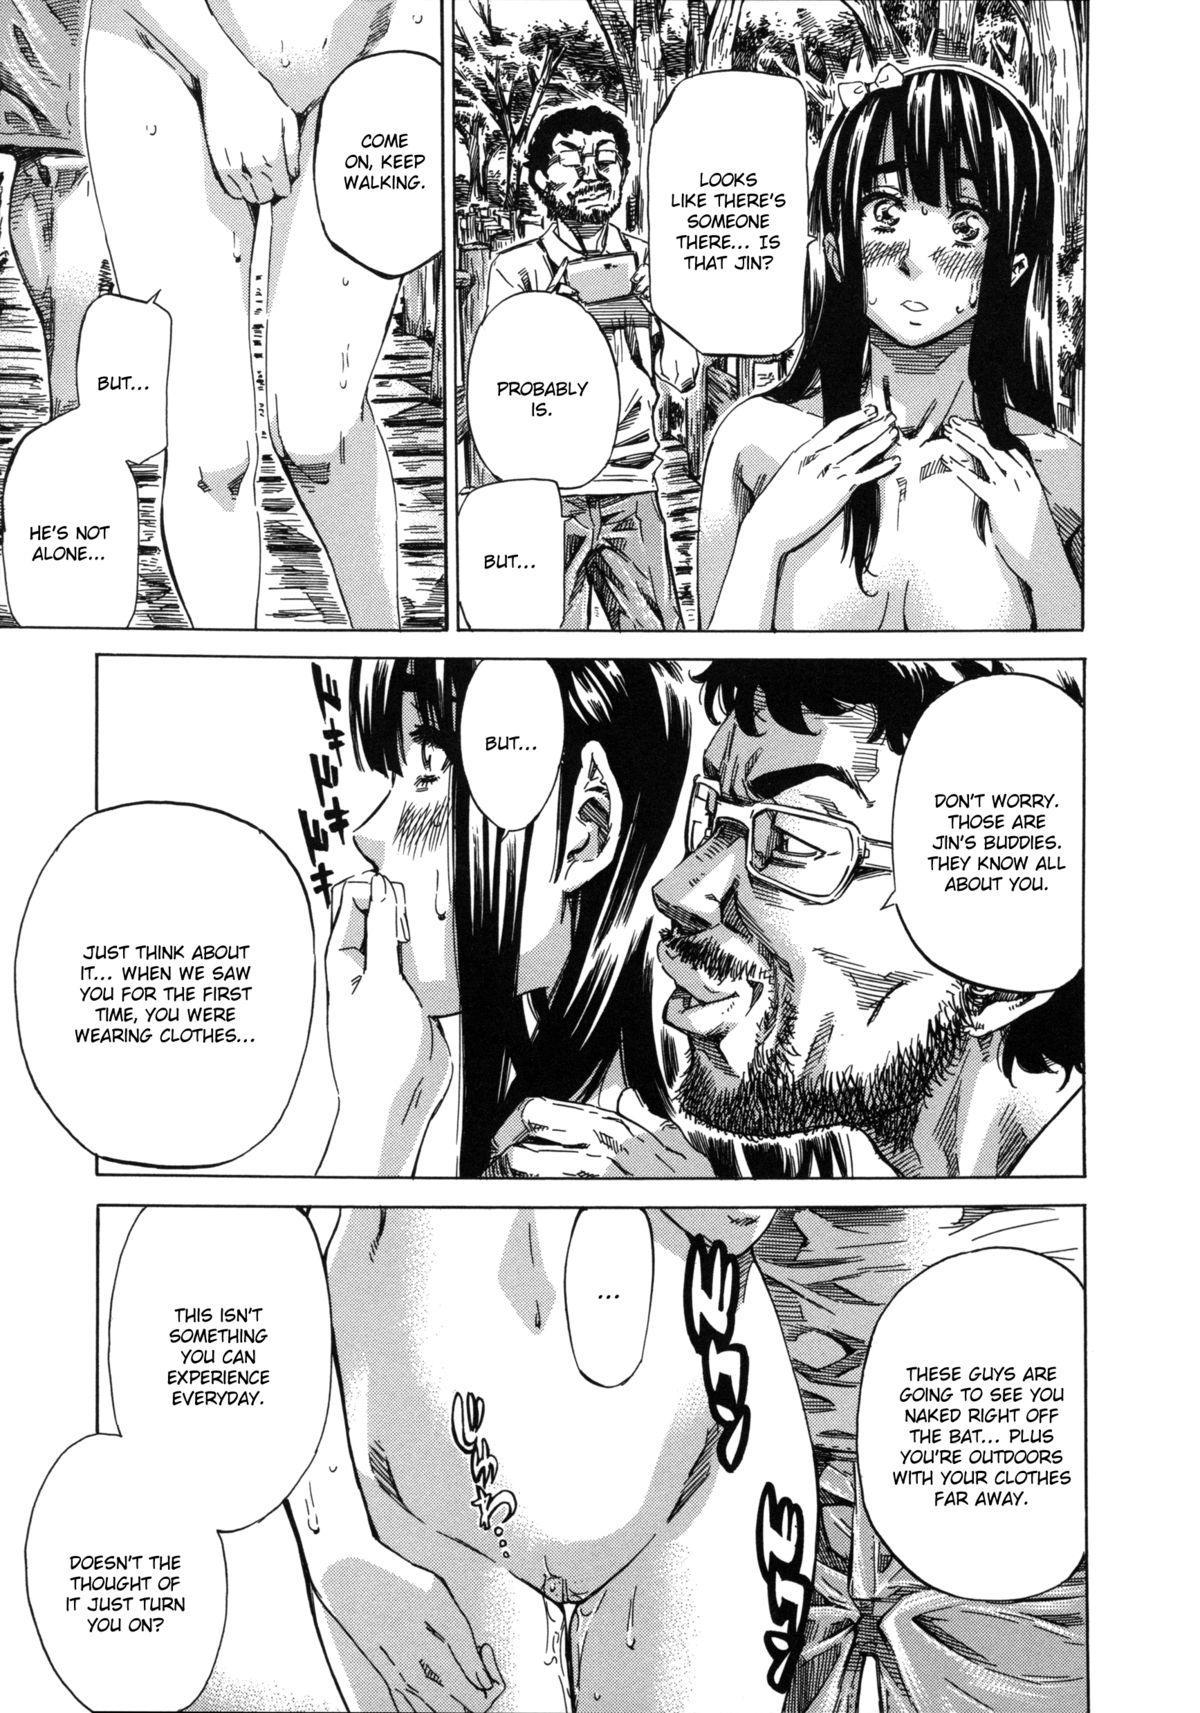 Kashiwazaki Miki wa Ironna Basho de Zenra Sanpo Shitemita | Miki Kashiwazaki Goes Naked in All Sorts of Places 177